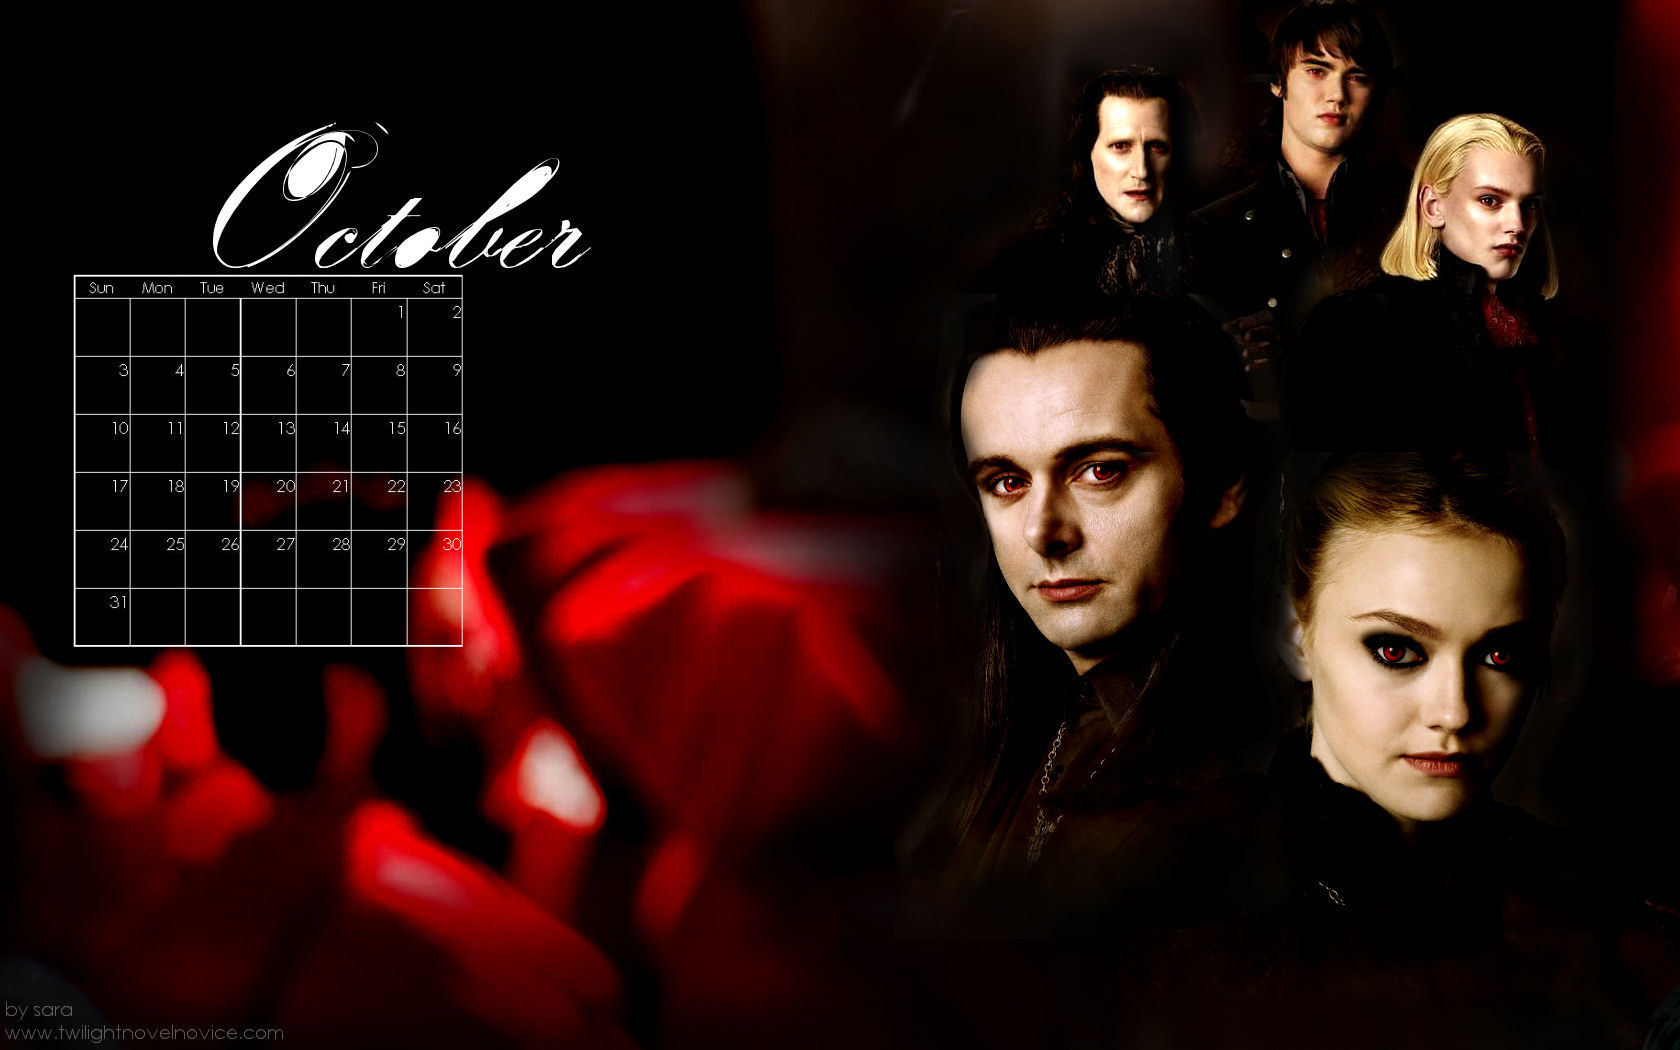 14 twilight saga wallpapers - photo #22